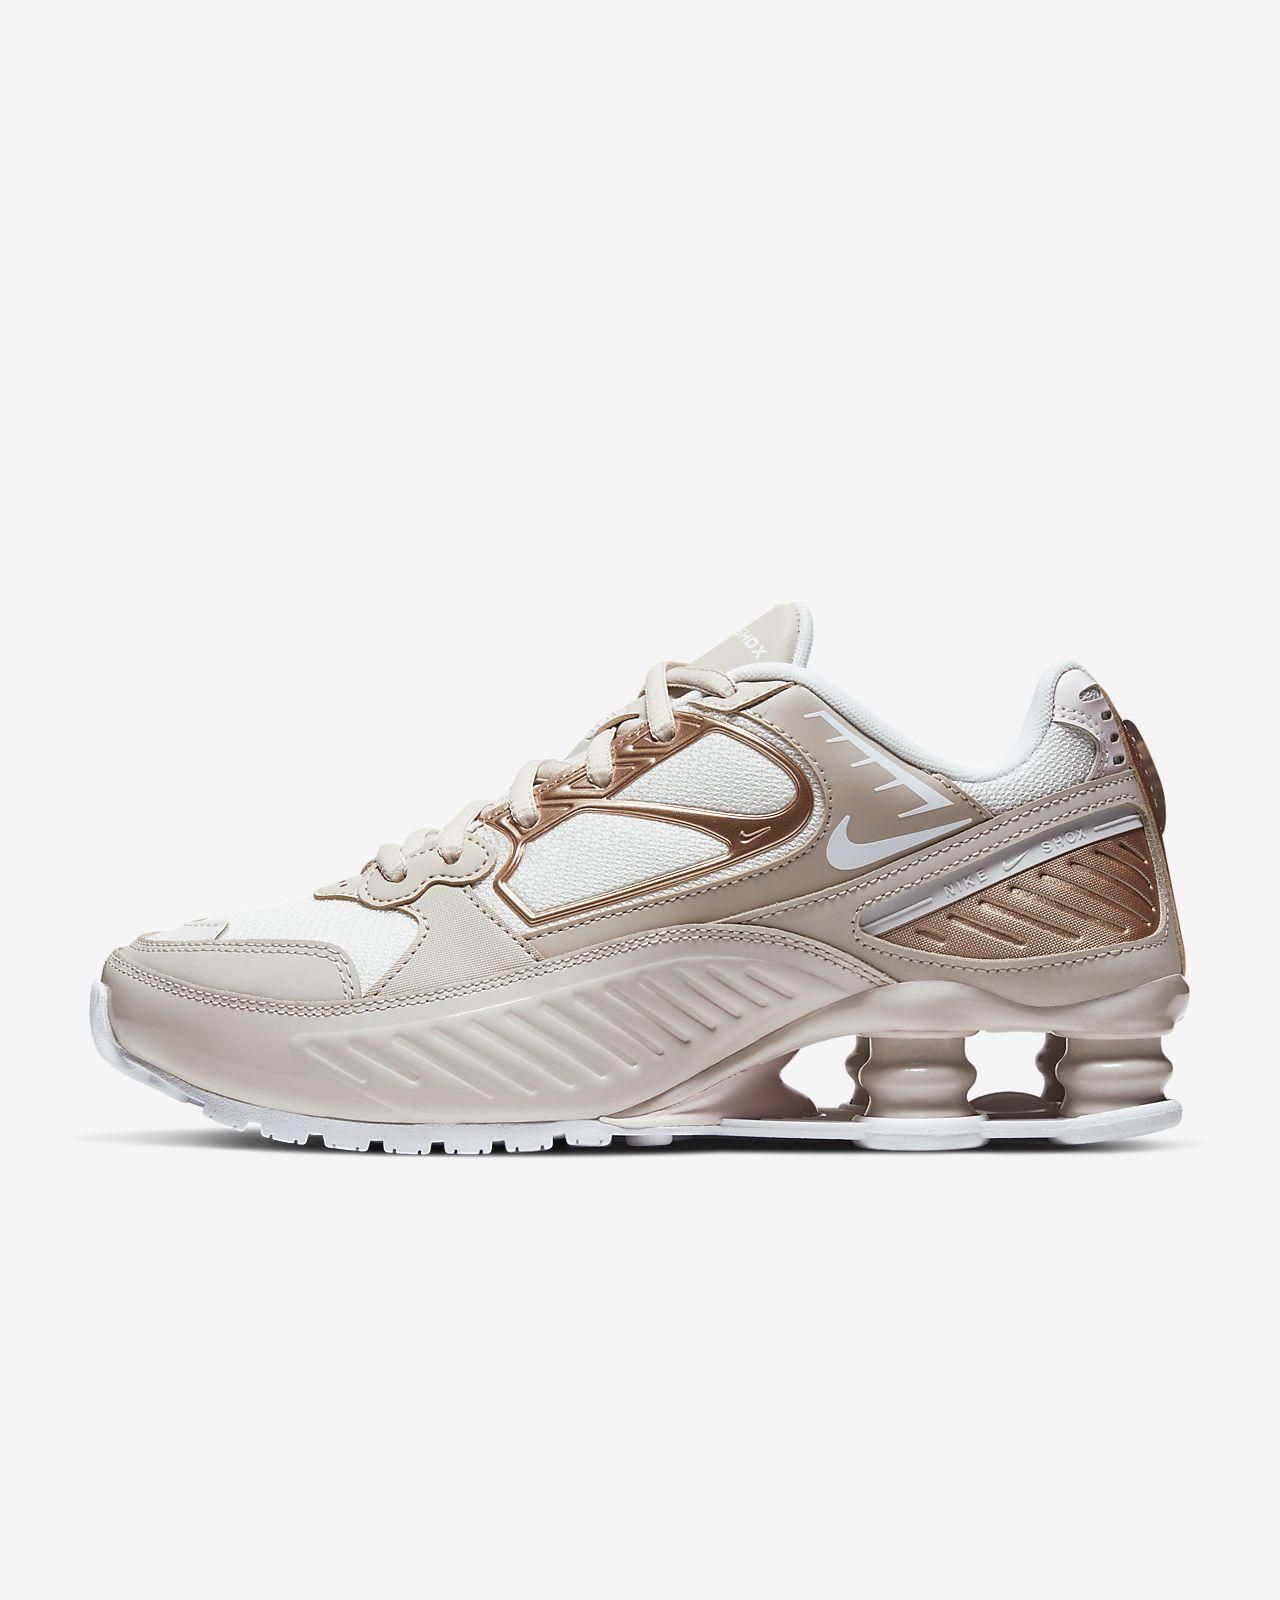 Nike 9000 Shoe Women's Enigma Shox 80OXknPw